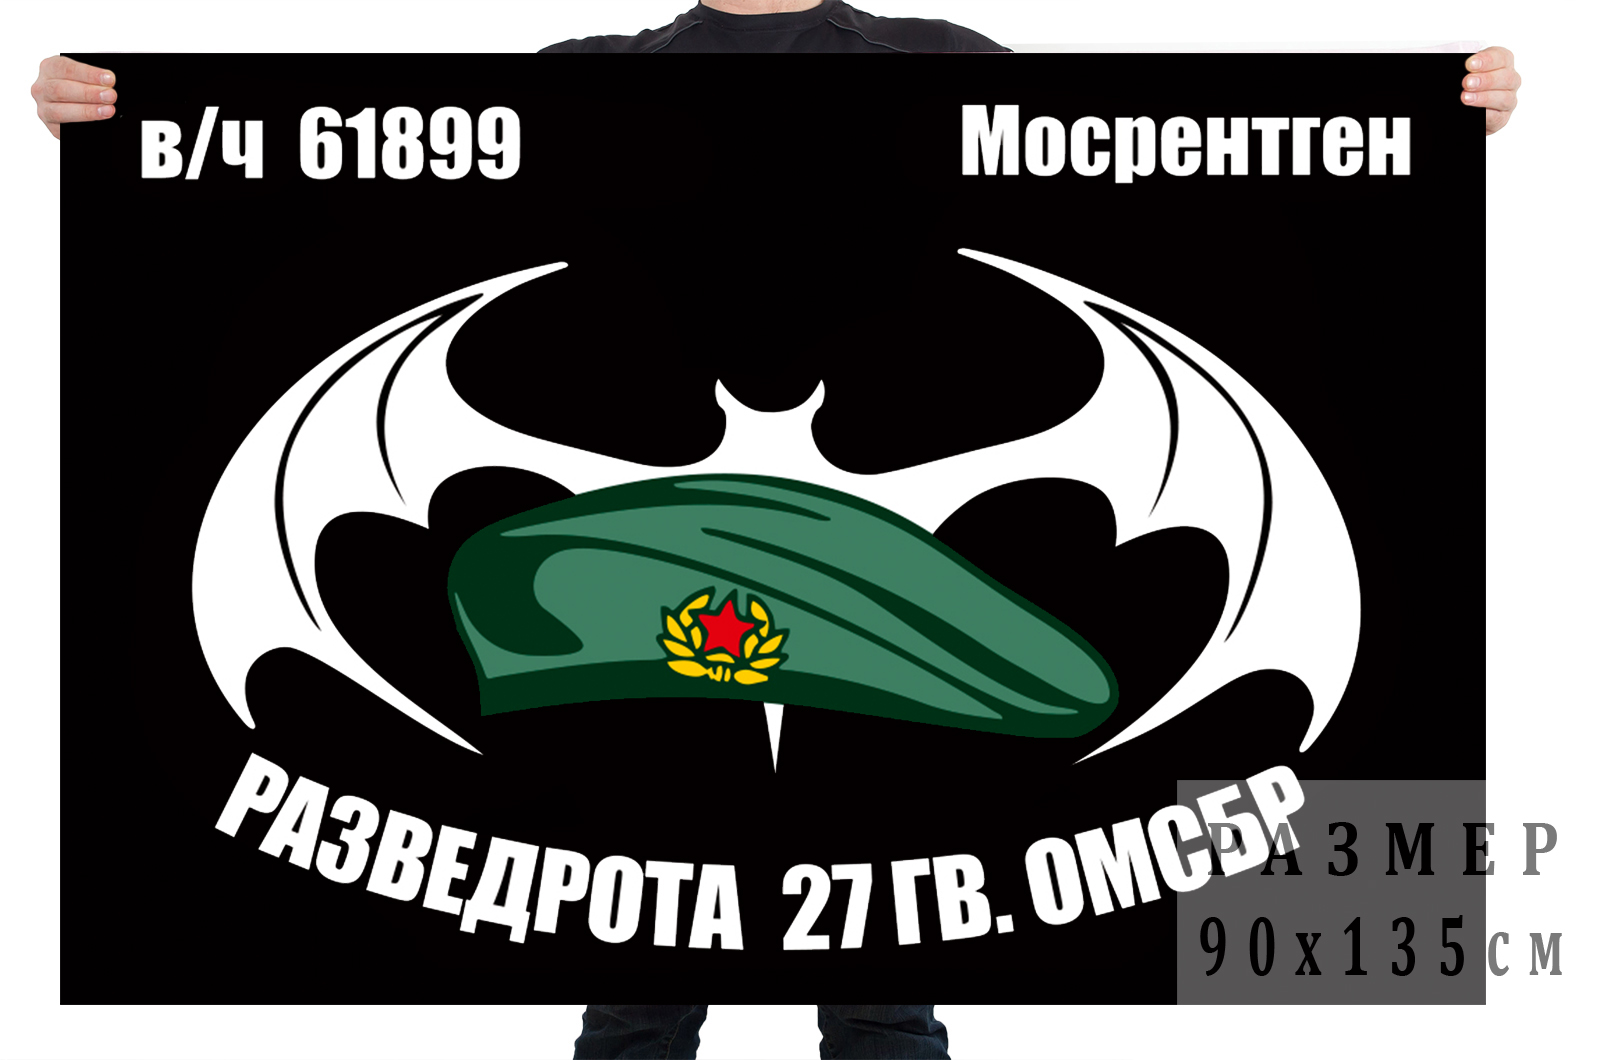 Флаг Разведроты 27 Гв. ОМСБр